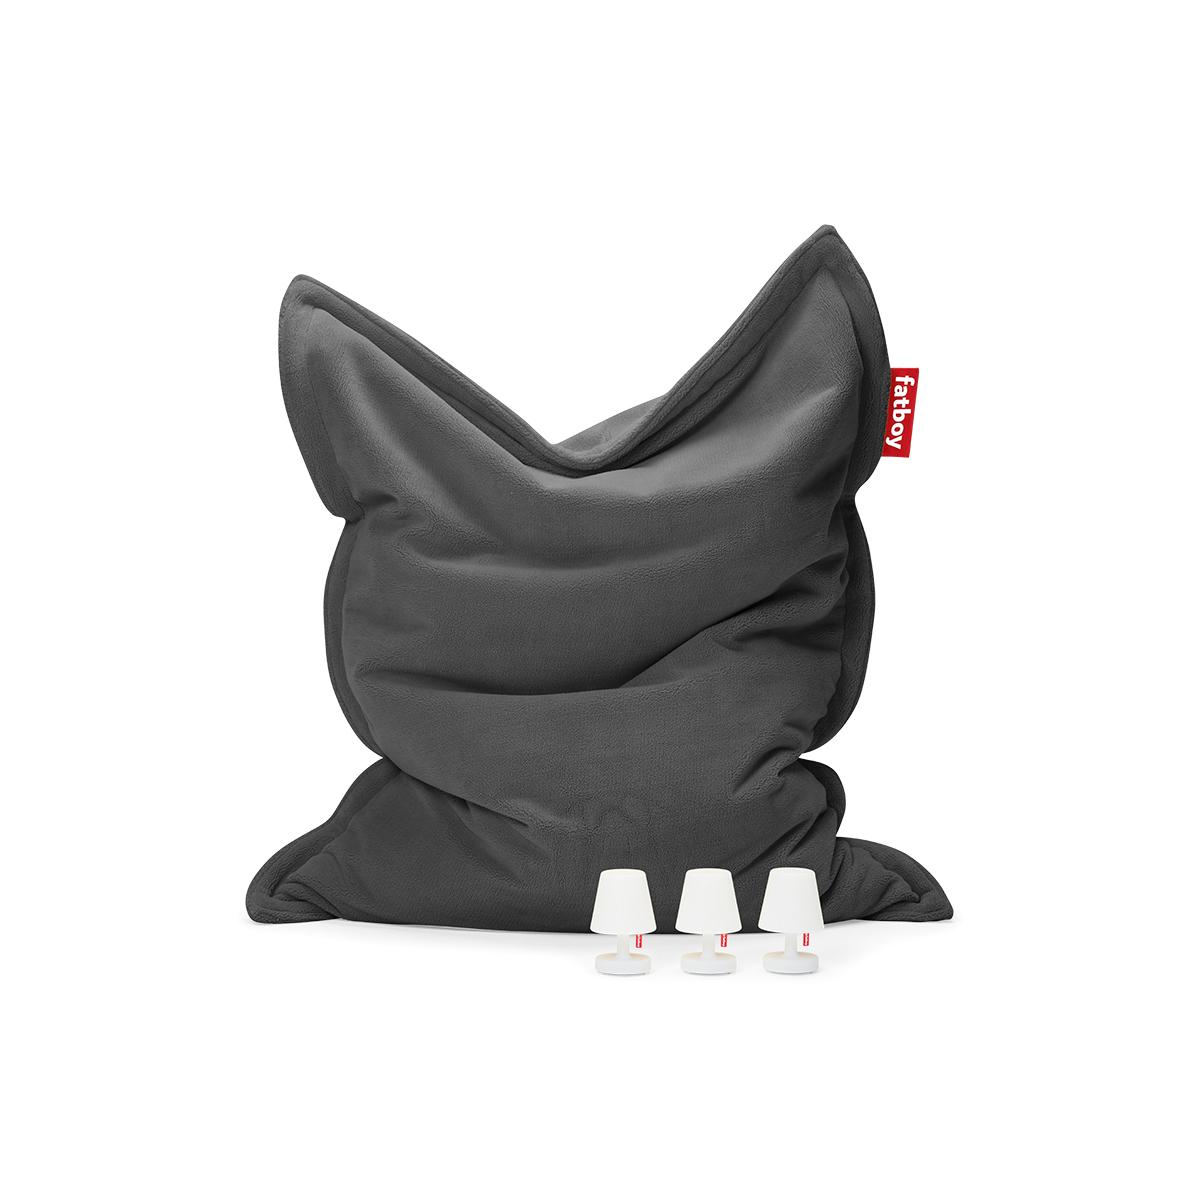 8719773032010 FATBOY Teddy anthracite packshotplus 01